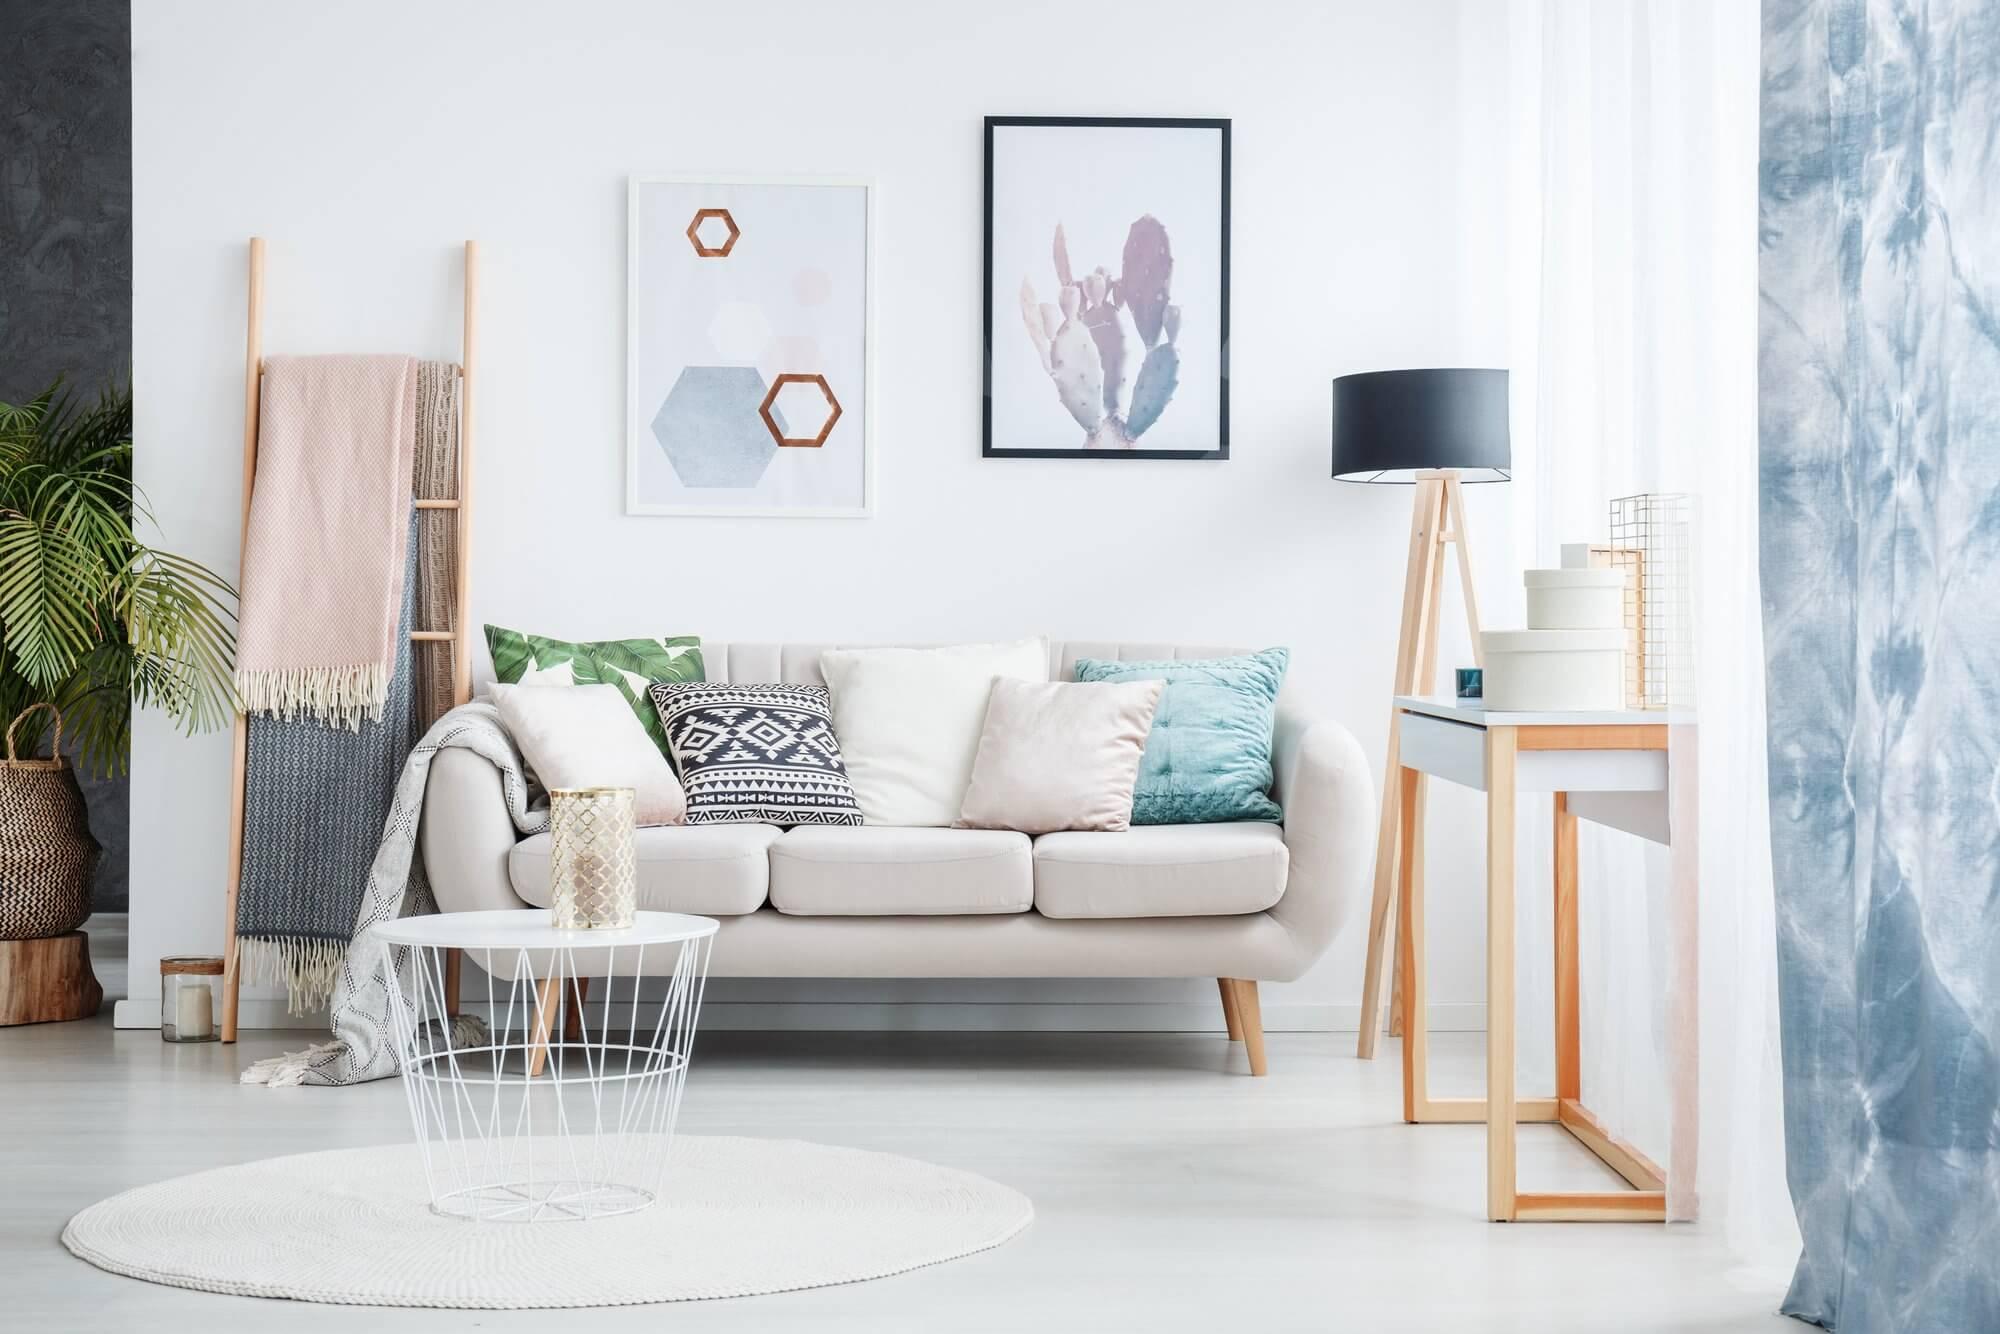 Geometric Wall Art - Living Room Ideas On A Budget